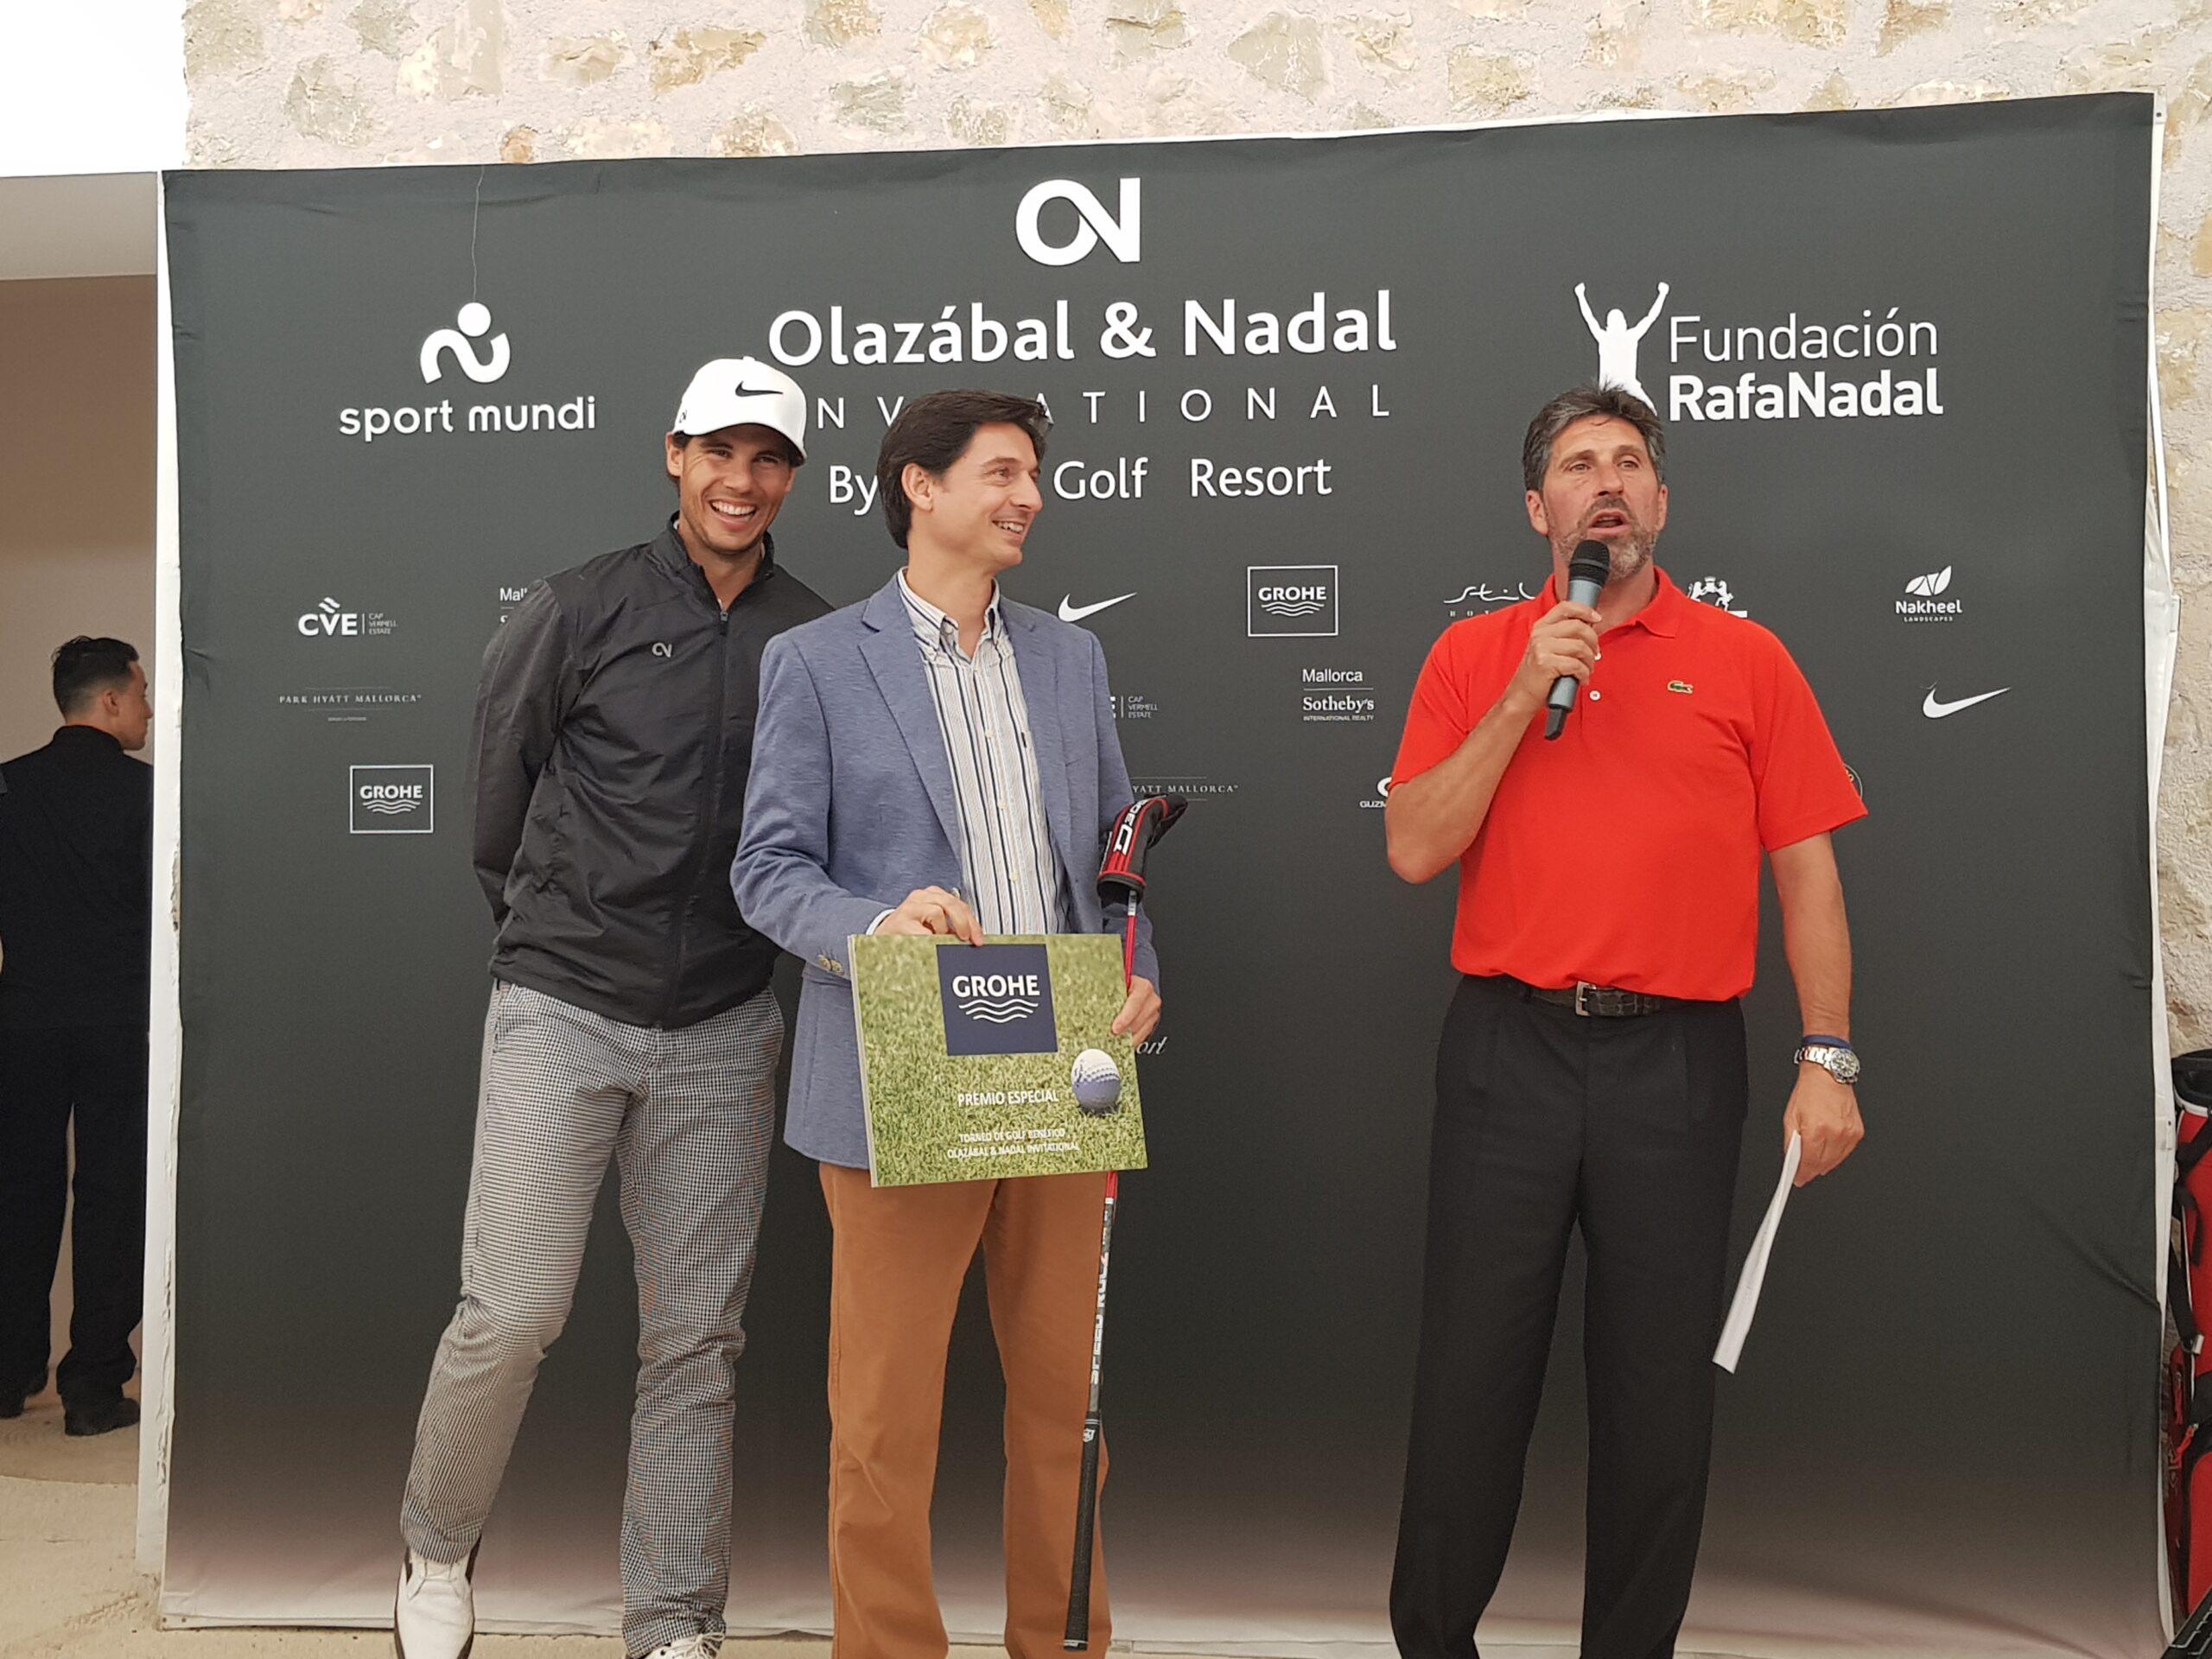 Rafa Nadal Event Foundation